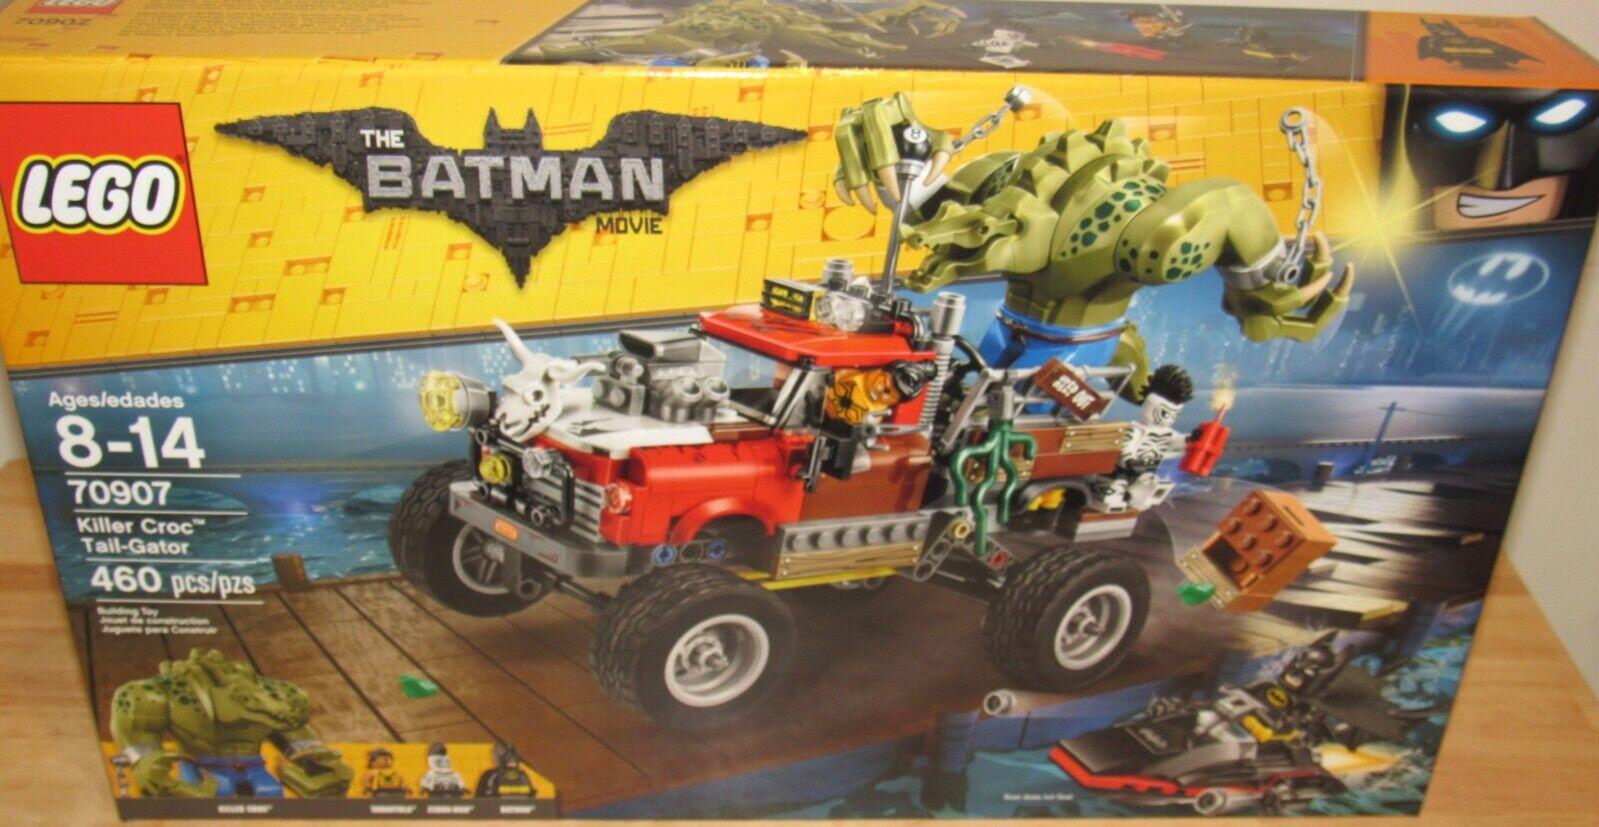 vendita online LEGO Batuomo Batuomo Batuomo Movie Killer Croc Tail-Gator 70907 NIB SEALED Zebra uomo Tarantula  Ultimo 2018